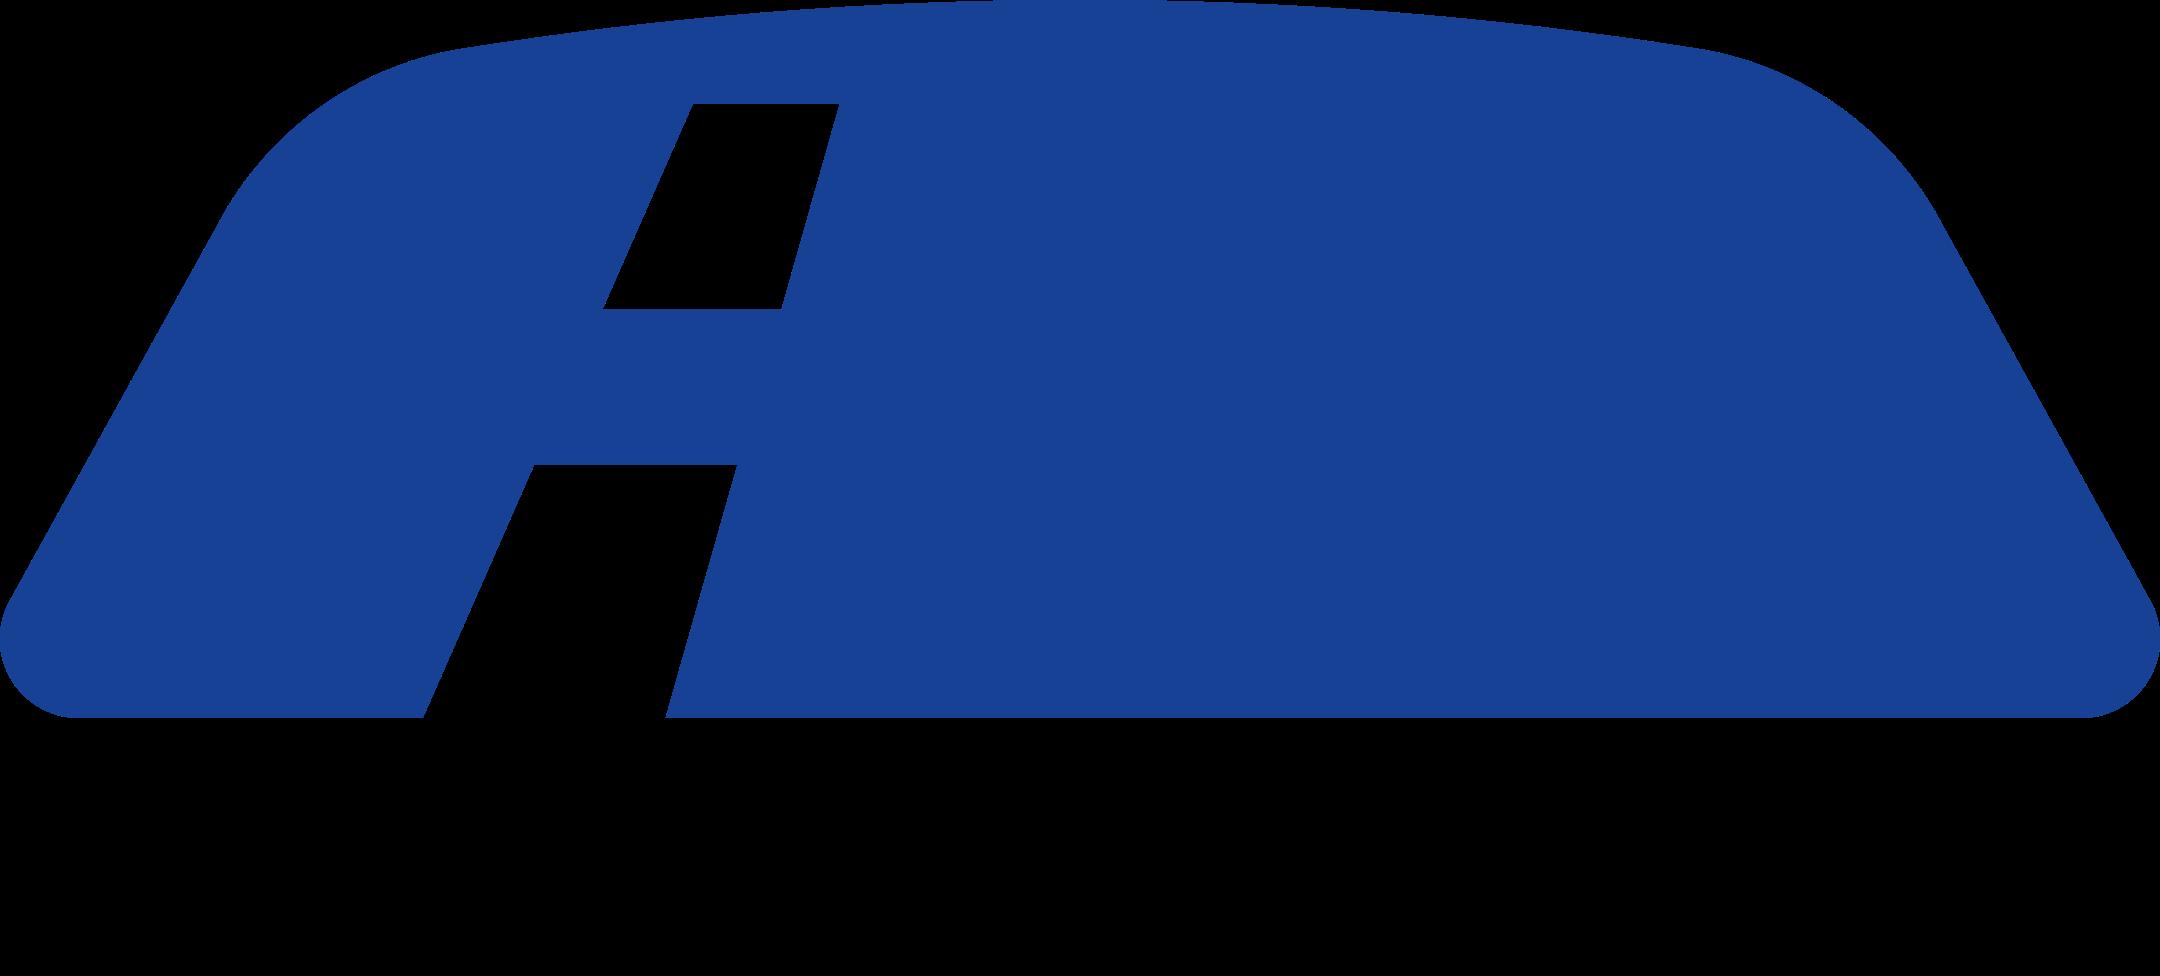 autoglass logo 1 - AUTOGLASS Logo